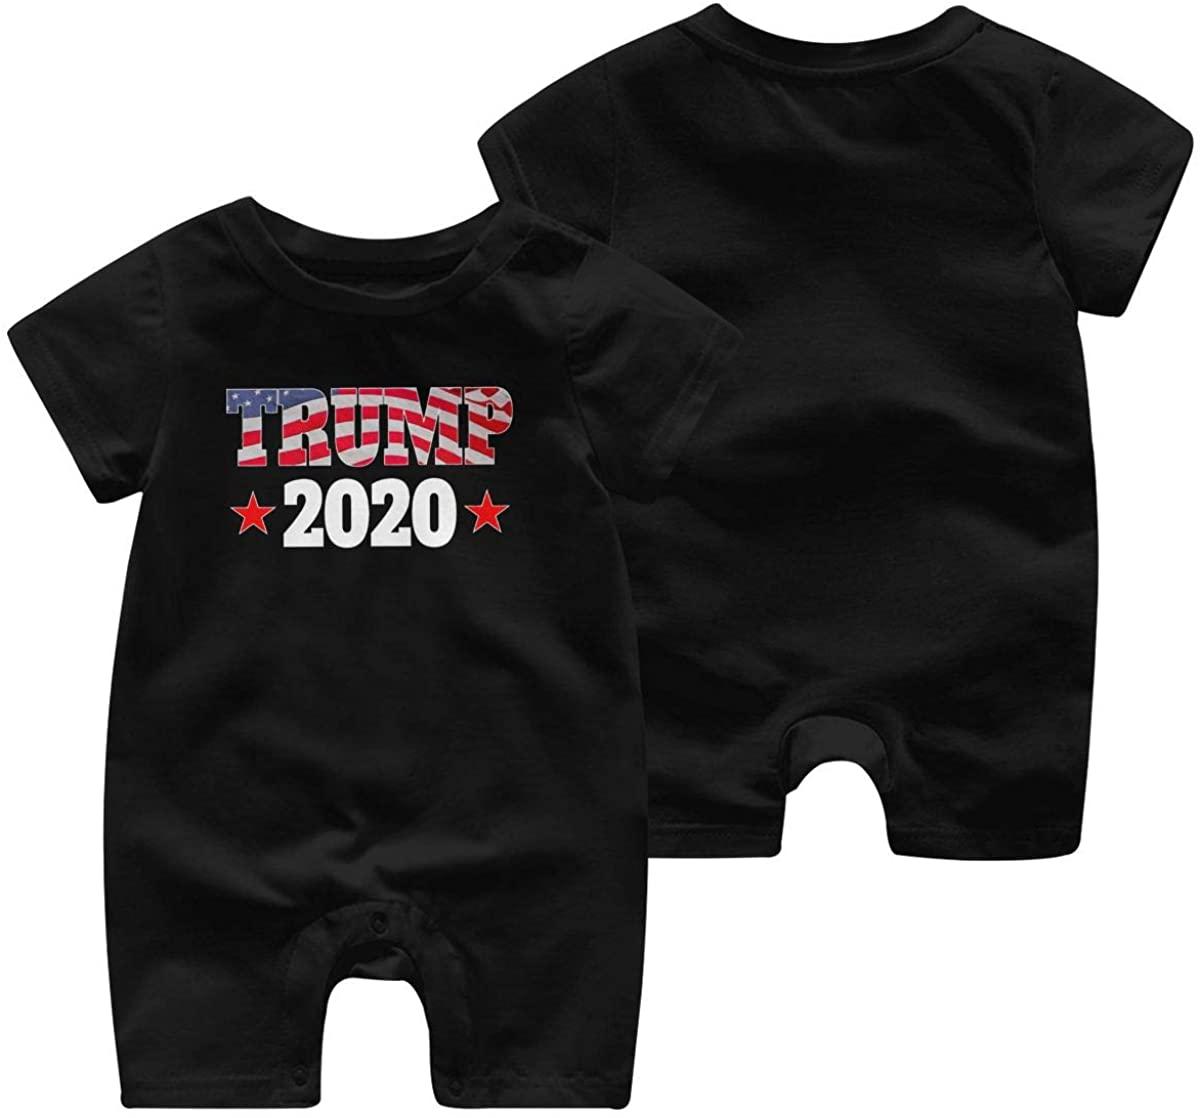 NOT Yeezy 2020 Kanye West President Trump Baby Jumpsuit Infant Romper Child 0-2t Bodysuit